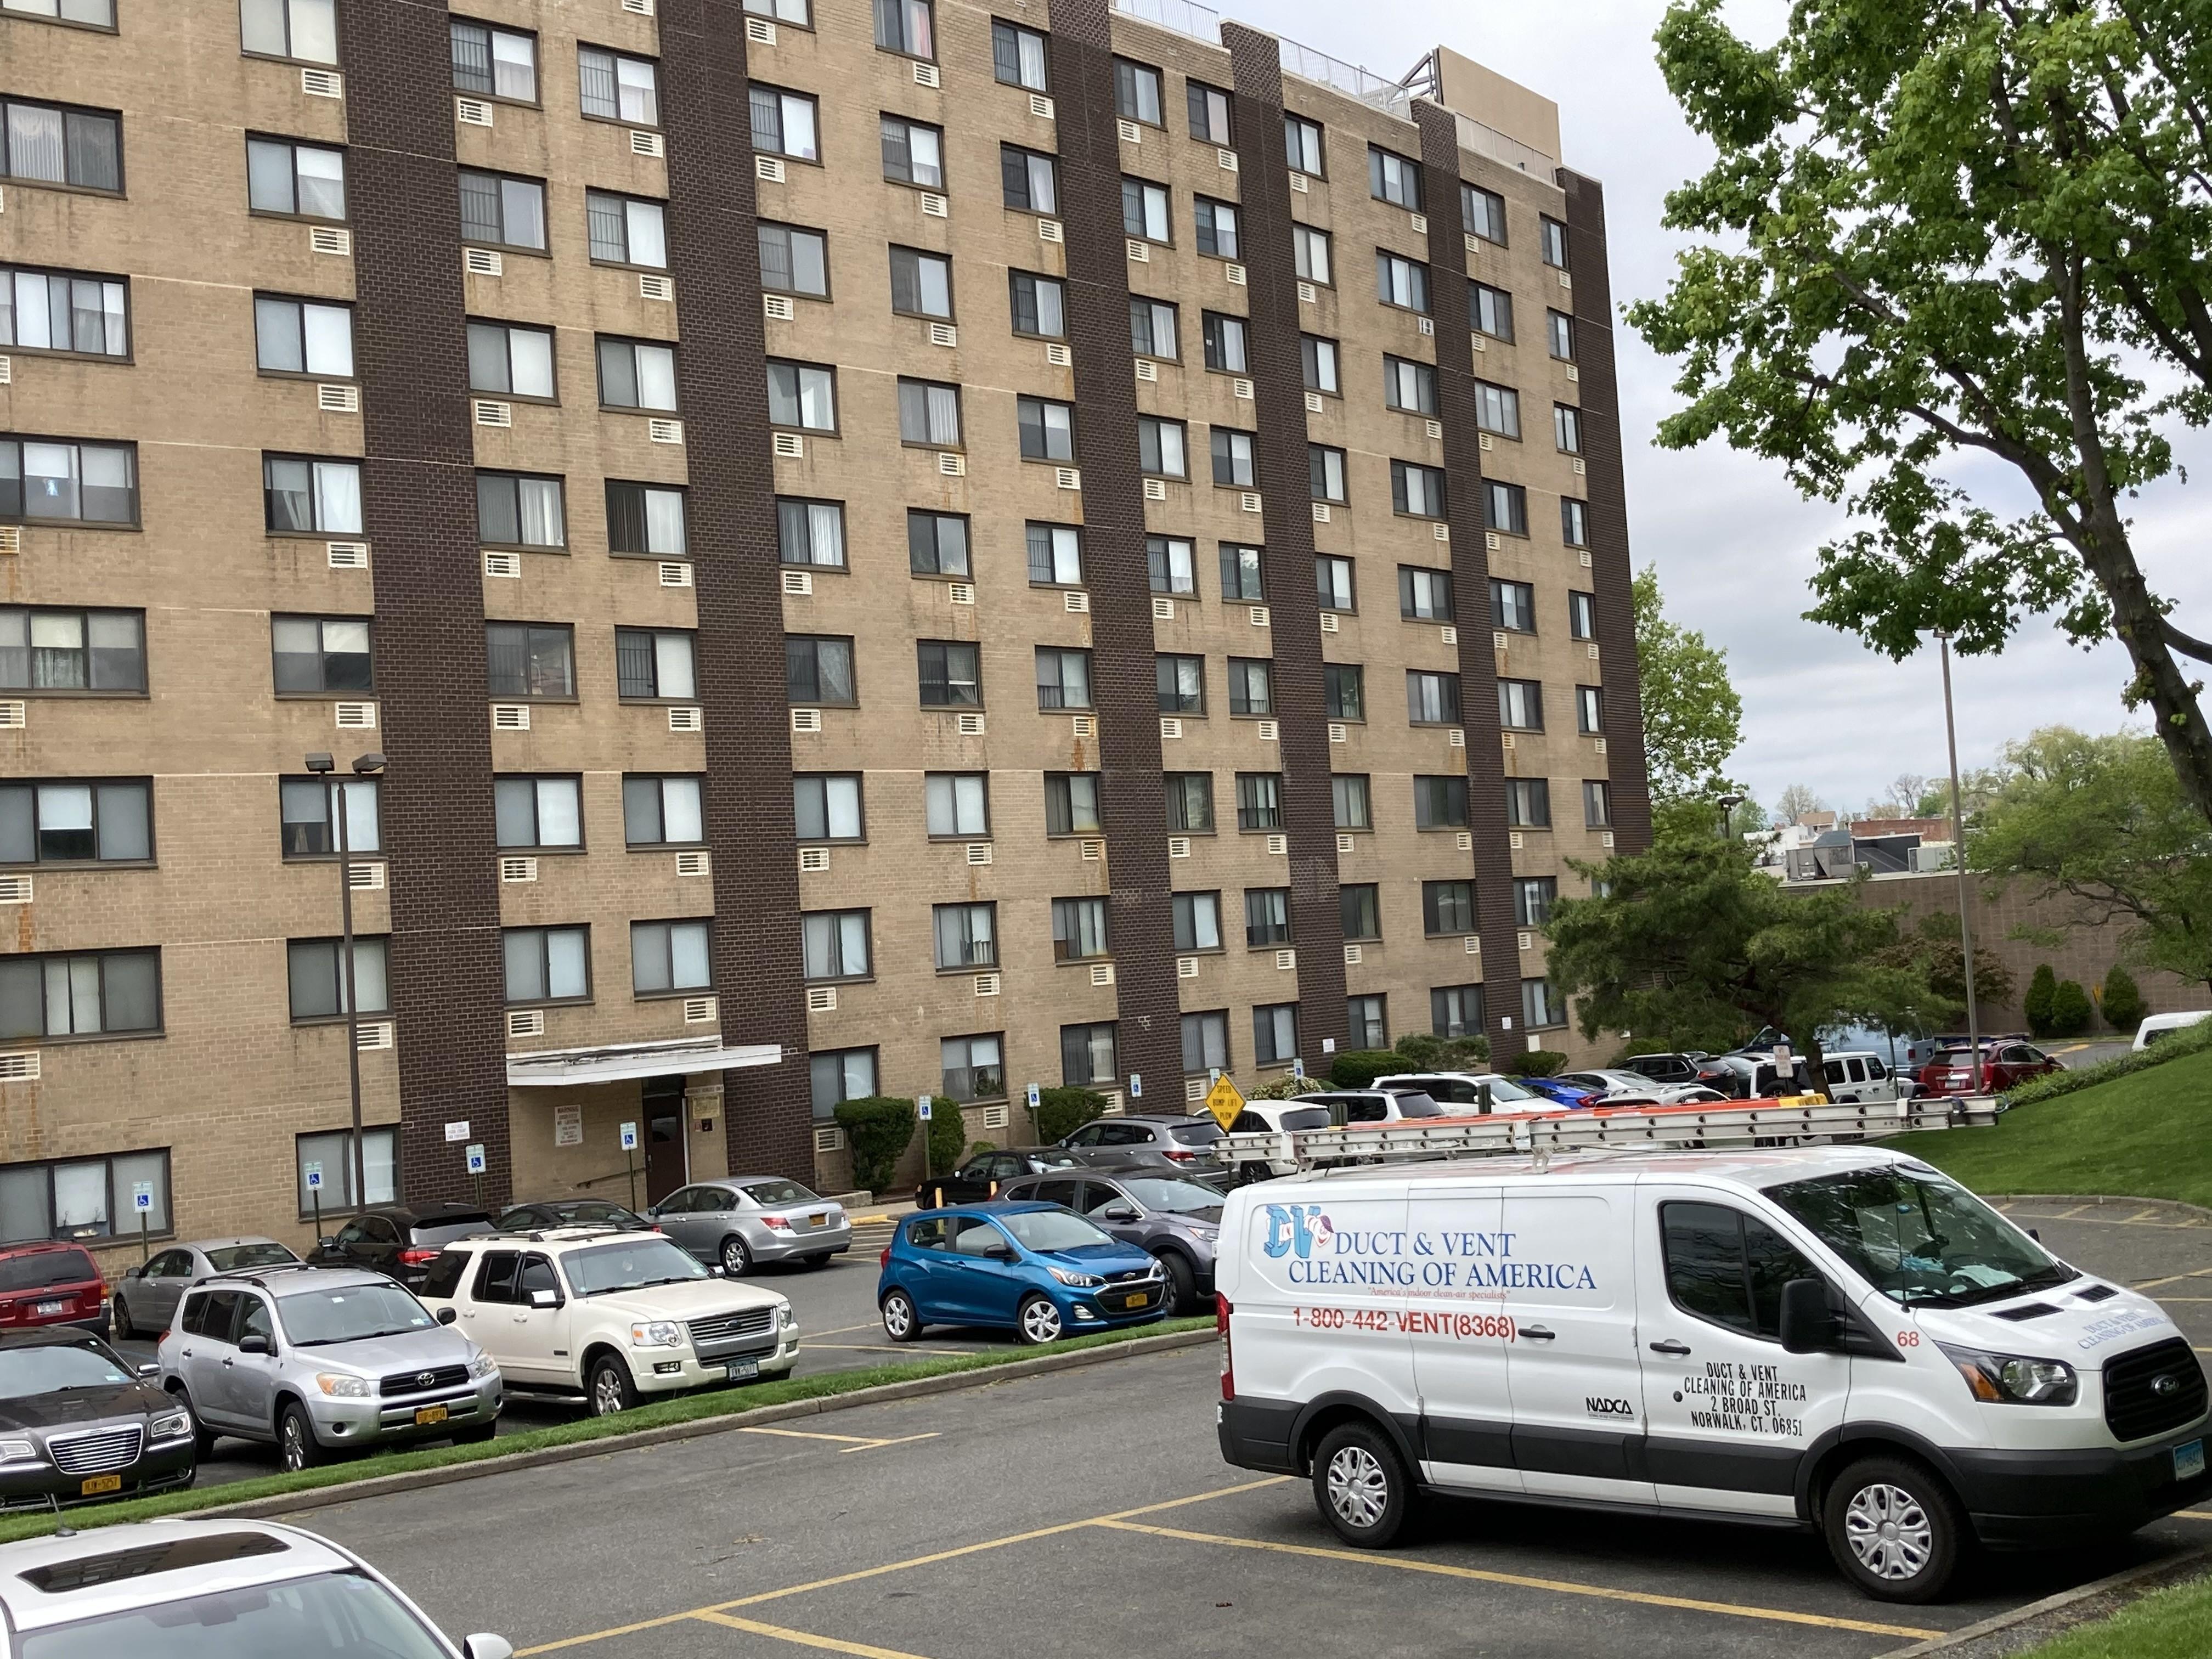 Asbury Terrace – Tarrytown, NY image002.jpg